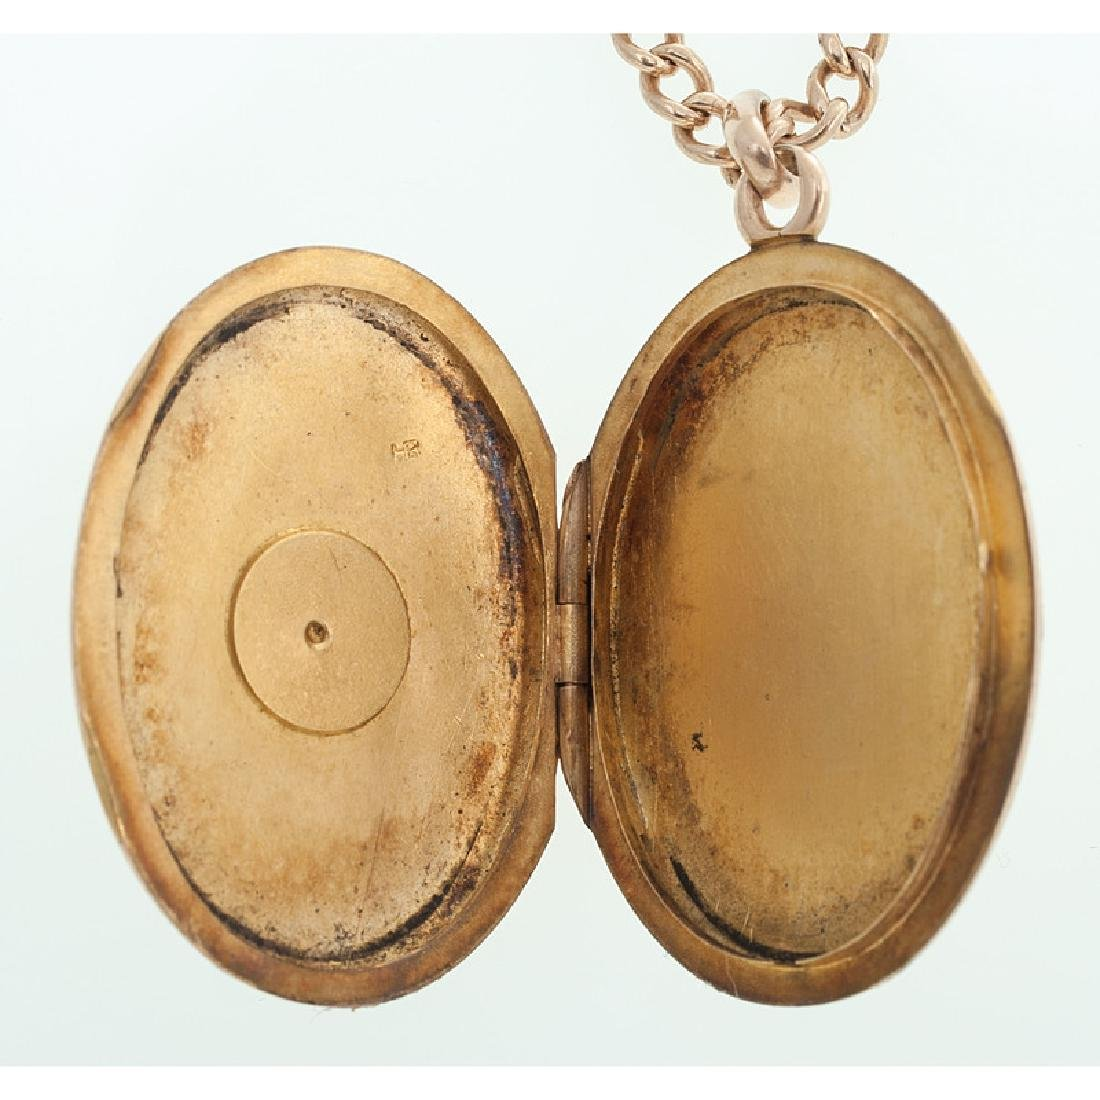 10 Karat Gold Fraternal Jewelry - 6